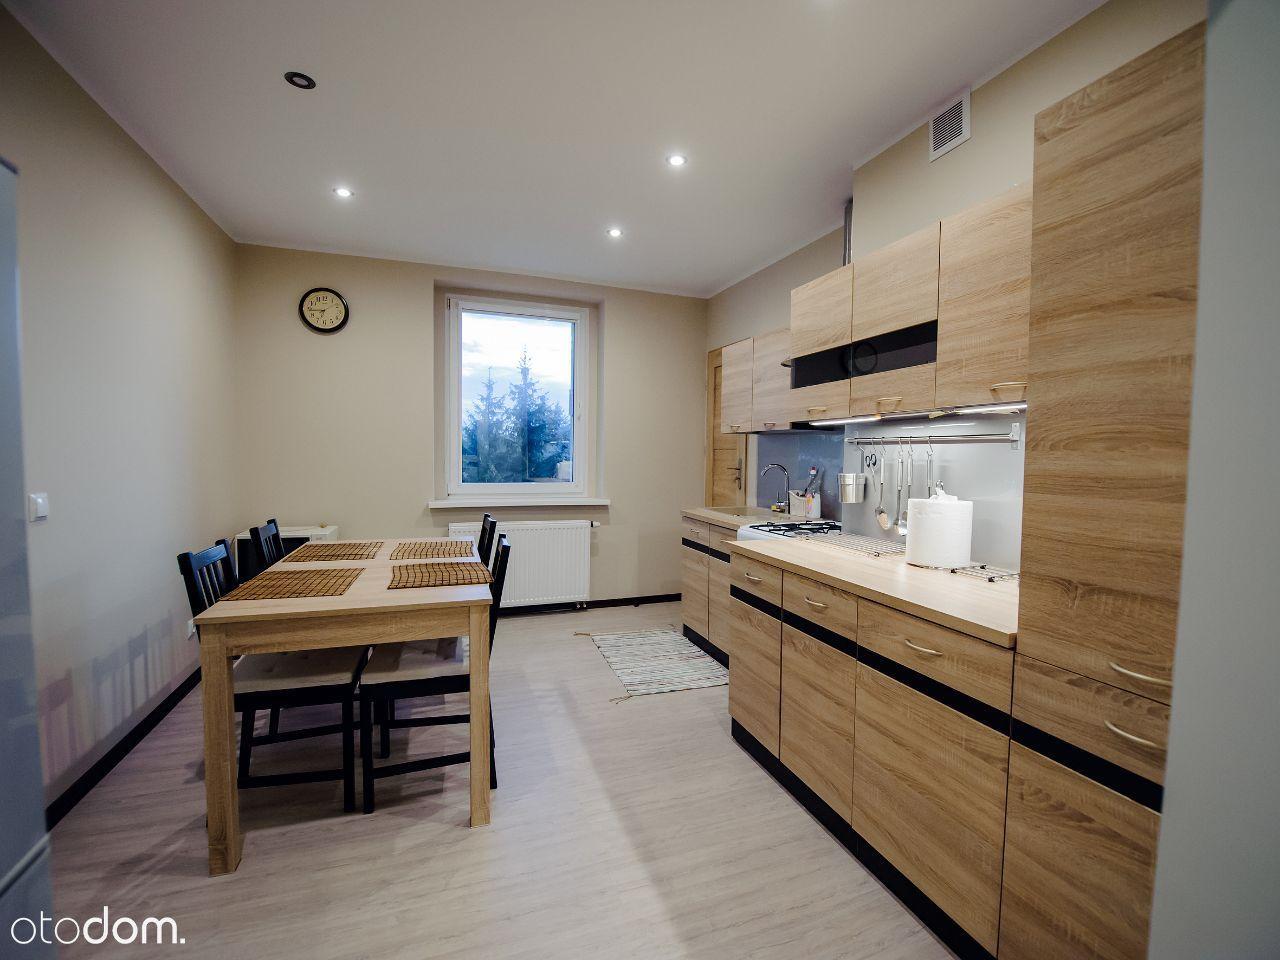 Pokój w mieszkaniu, po kapitalnym remoncie, ładne